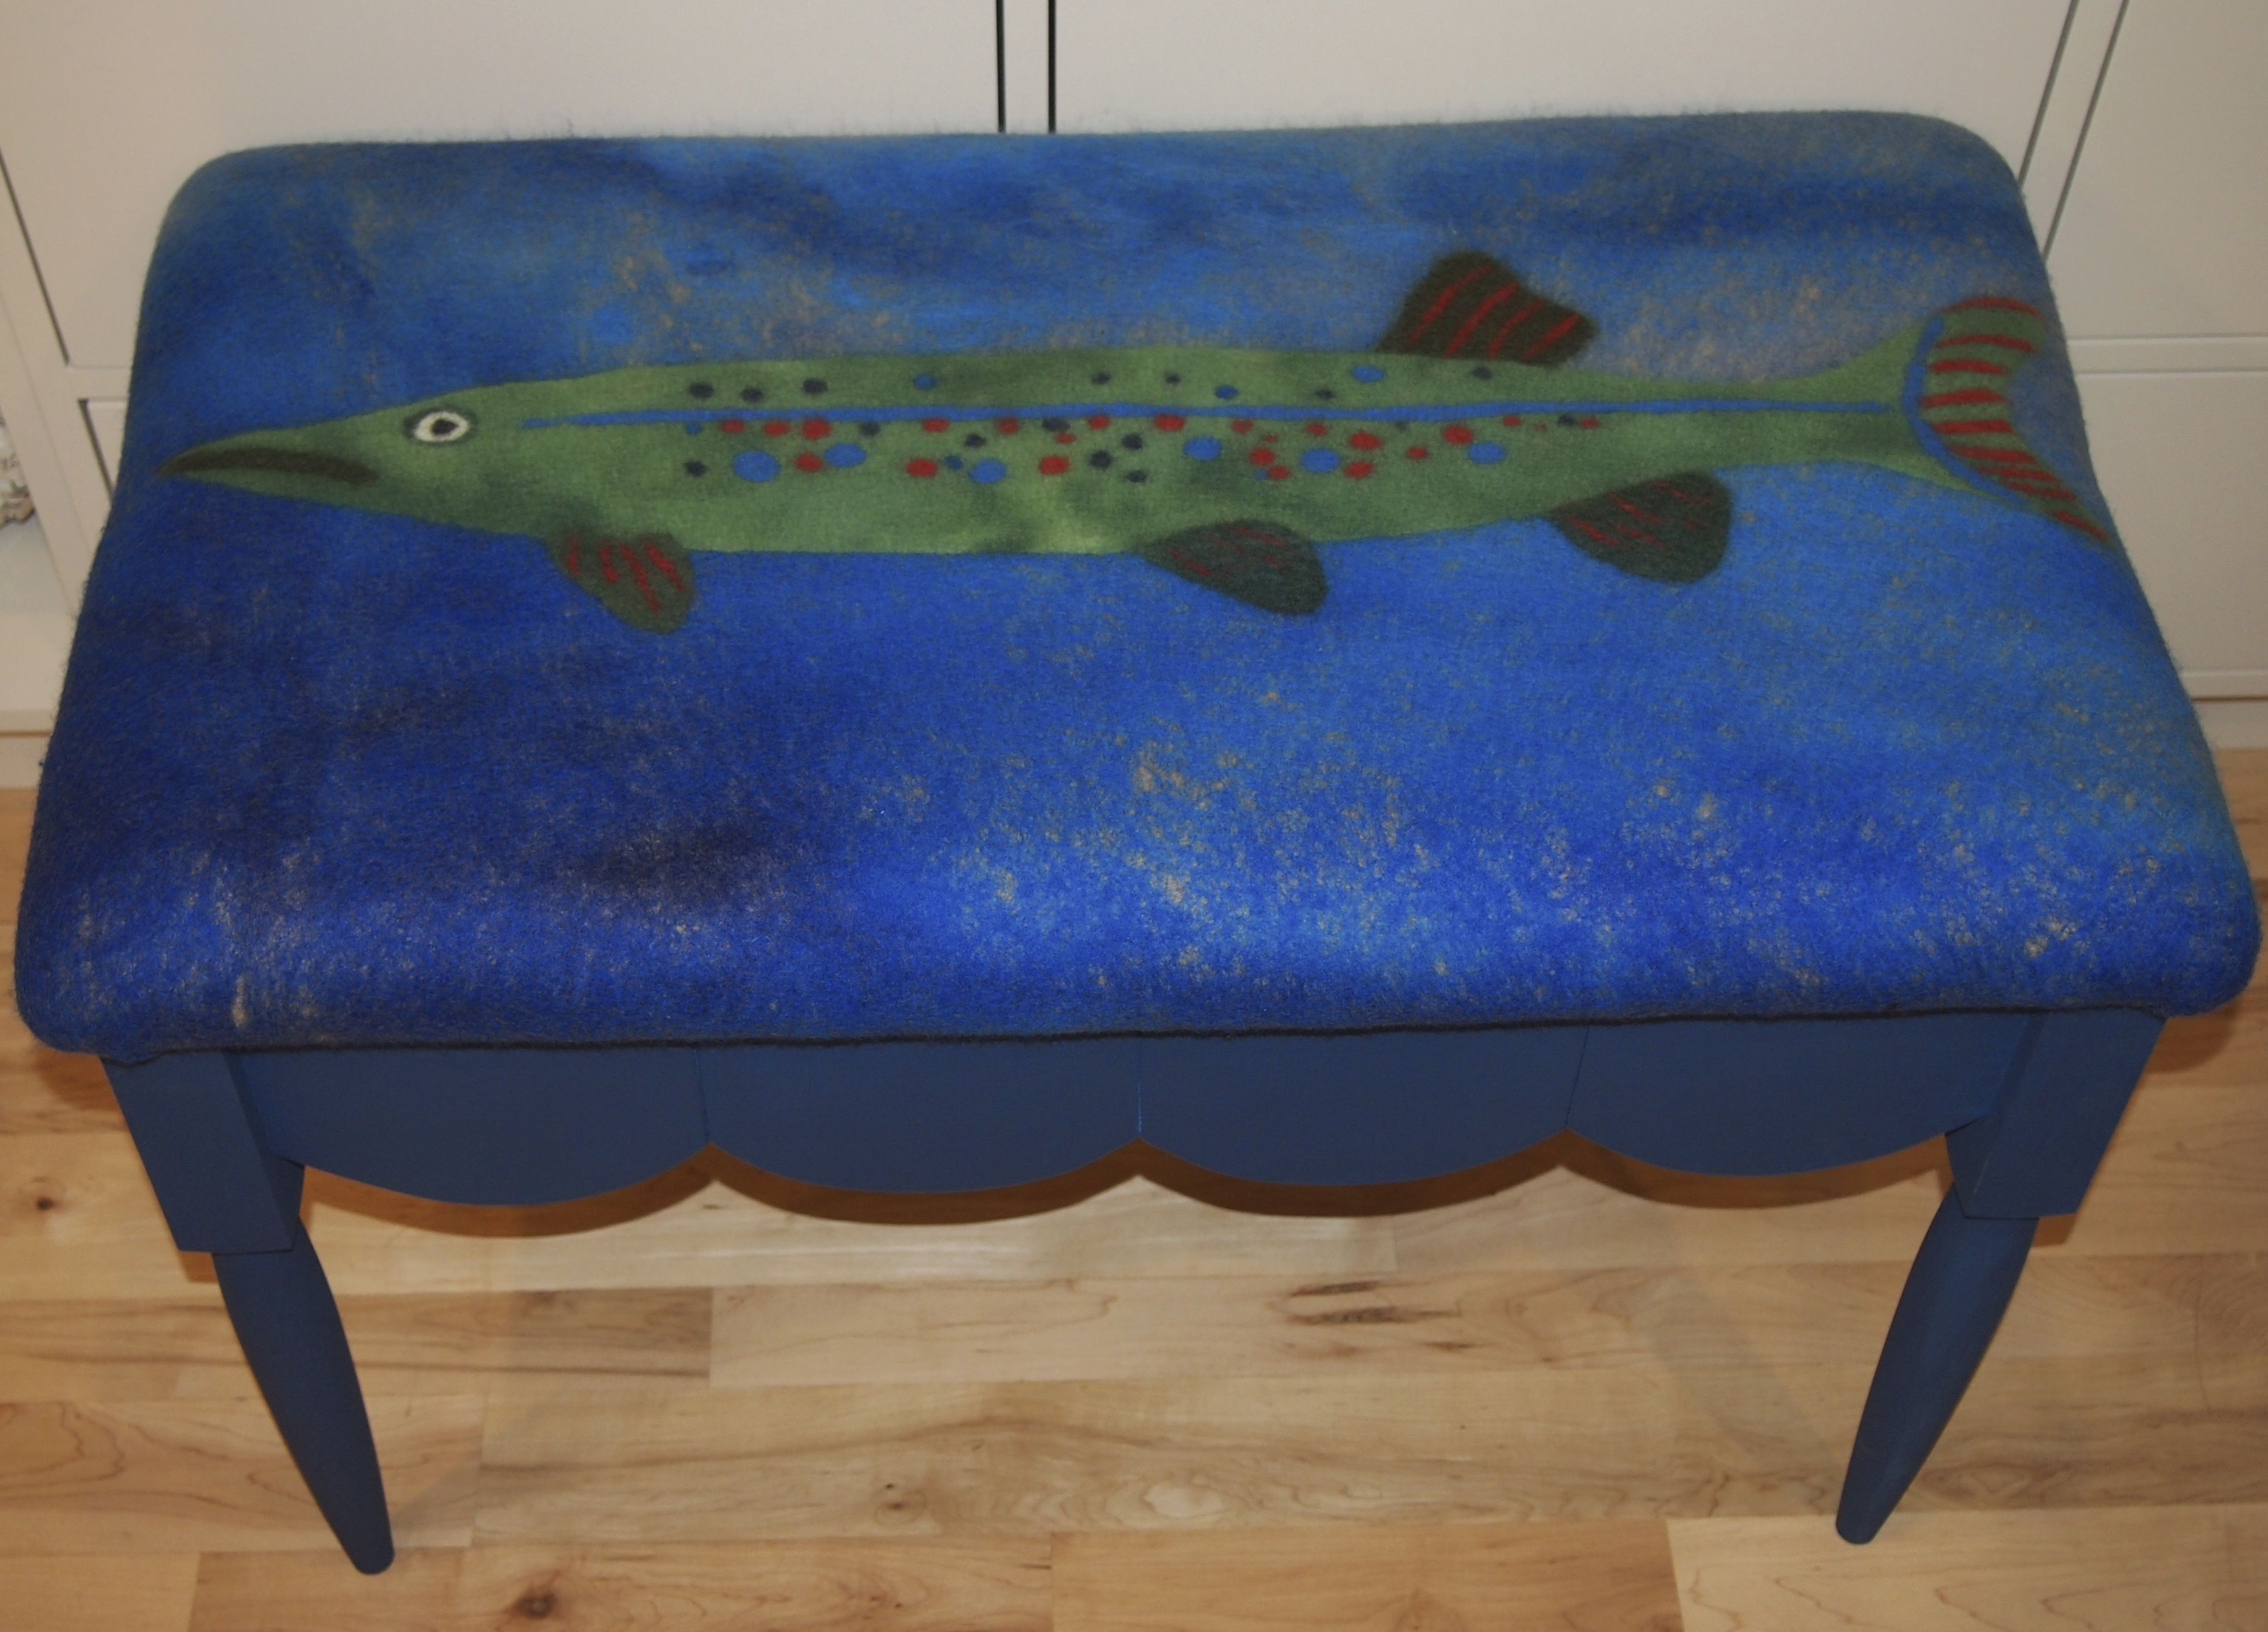 Big fish bench. Wet felted fabric by Bluebird Woolen Arts/Leslie Cervenka